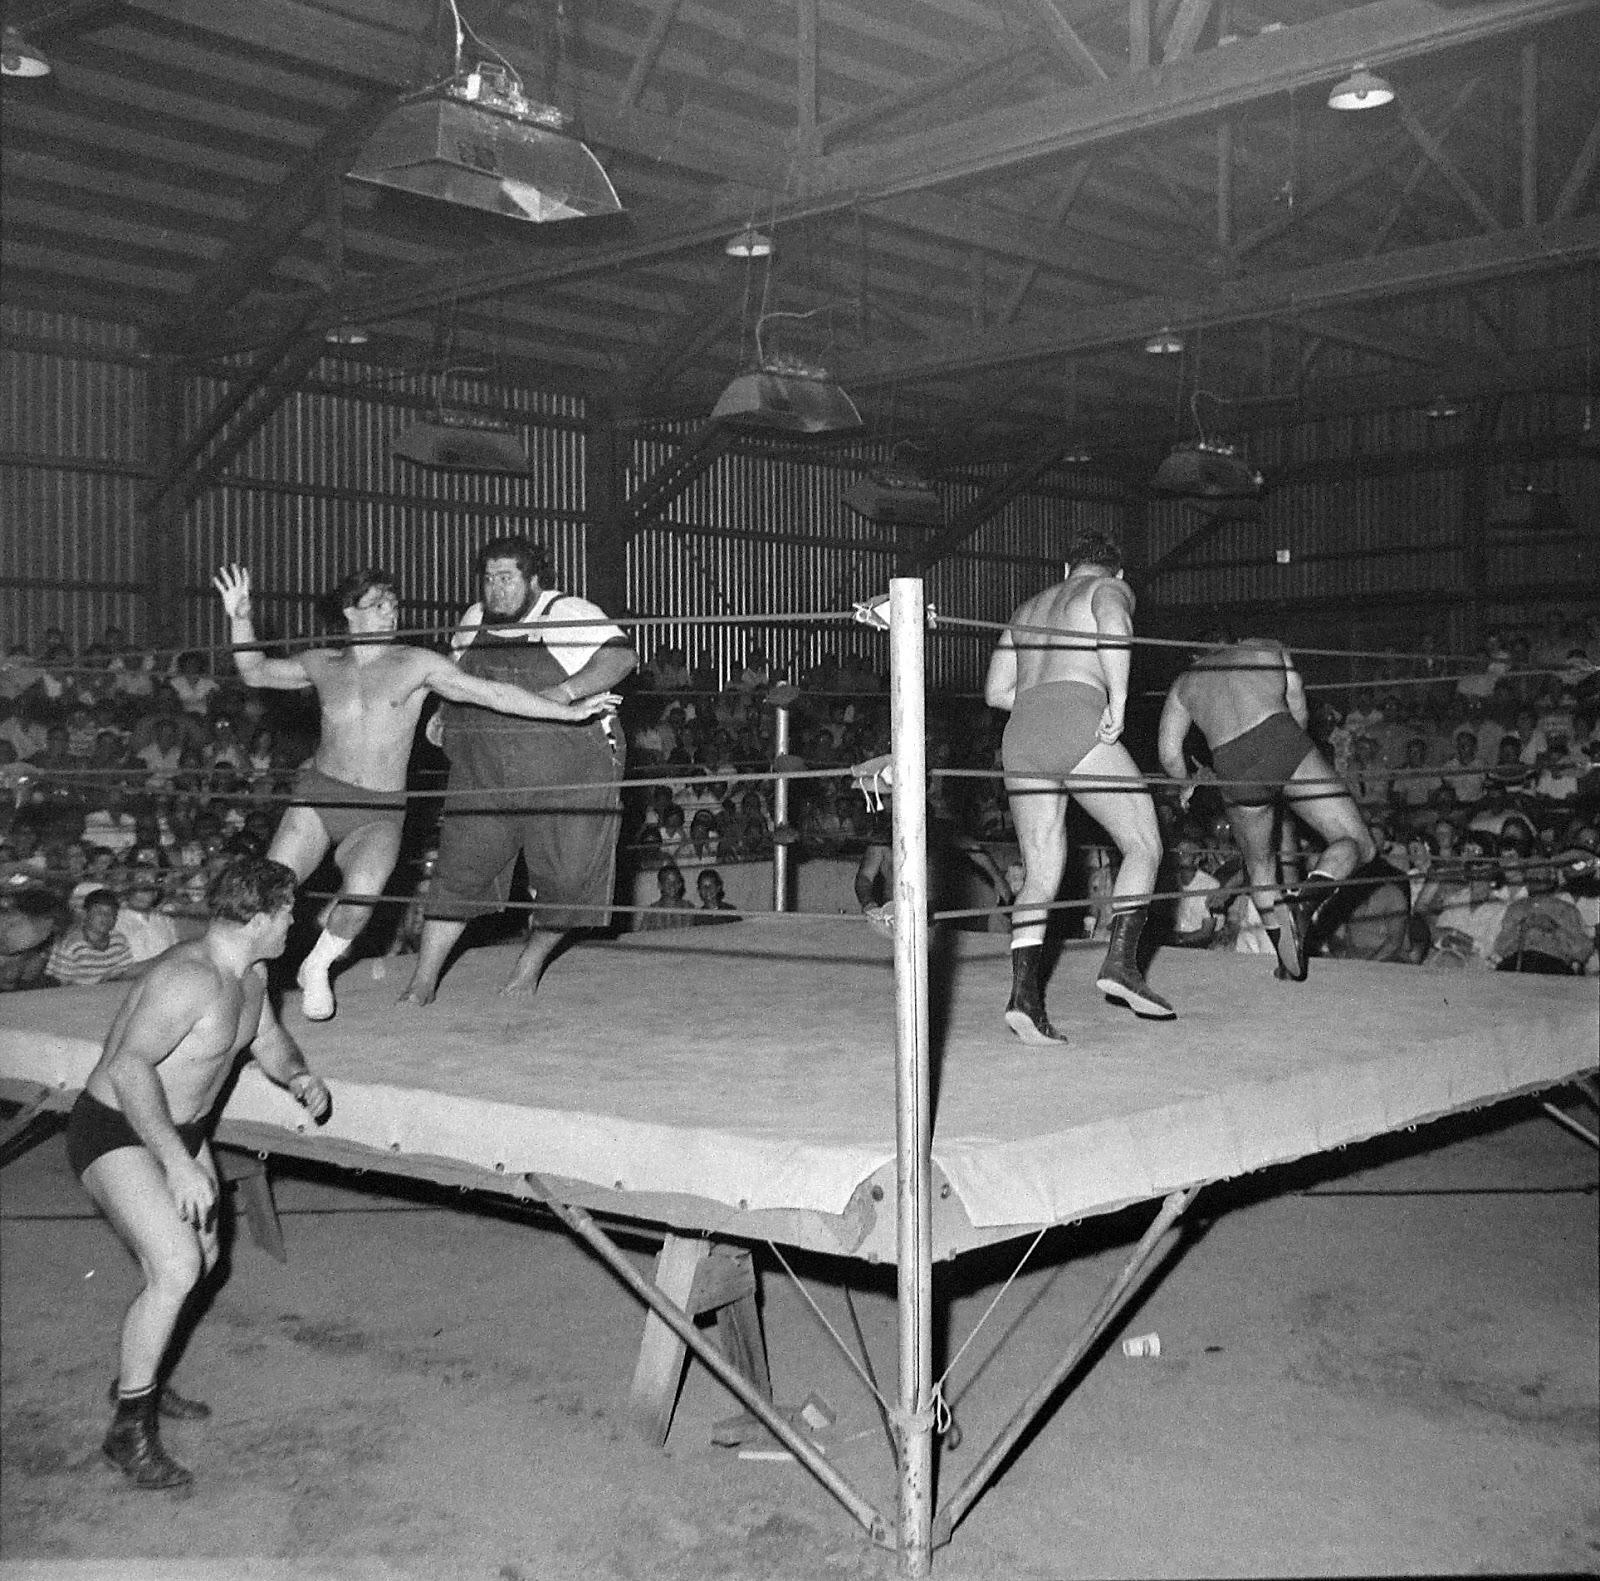 Vintage mixed pro wrestling